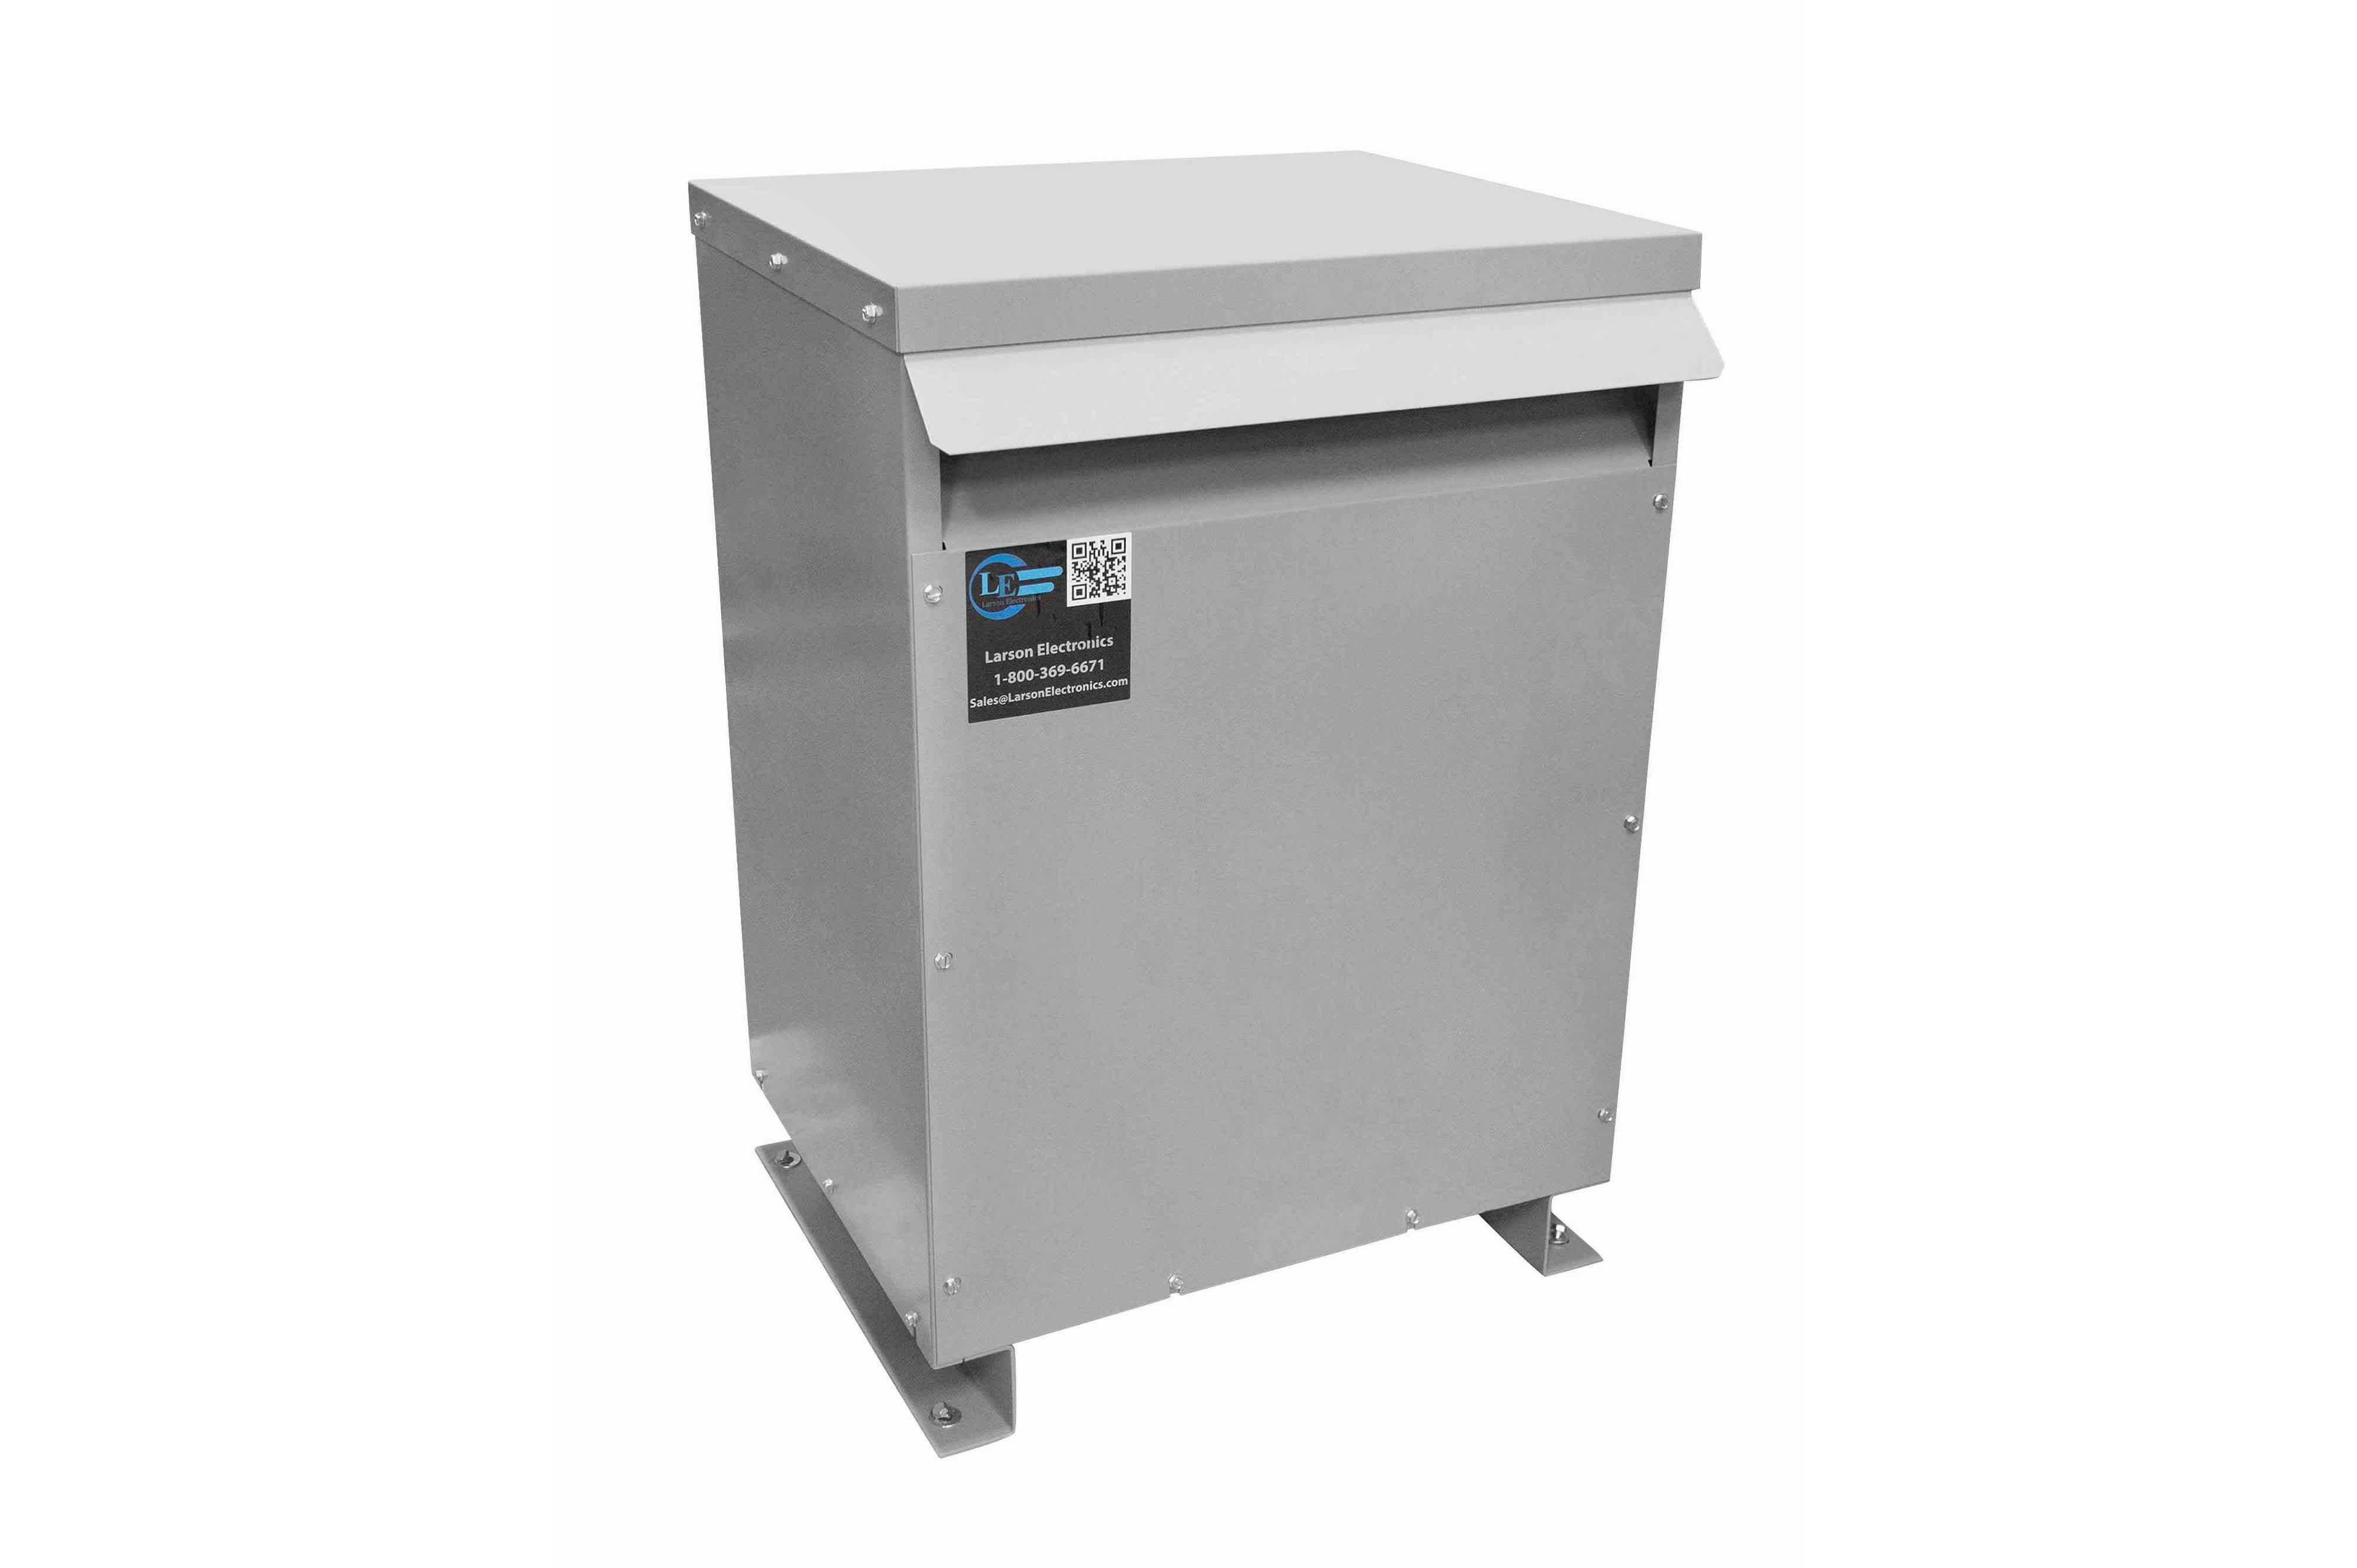 27 kVA 3PH Isolation Transformer, 600V Wye Primary, 415Y/240 Wye-N Secondary, N3R, Ventilated, 60 Hz